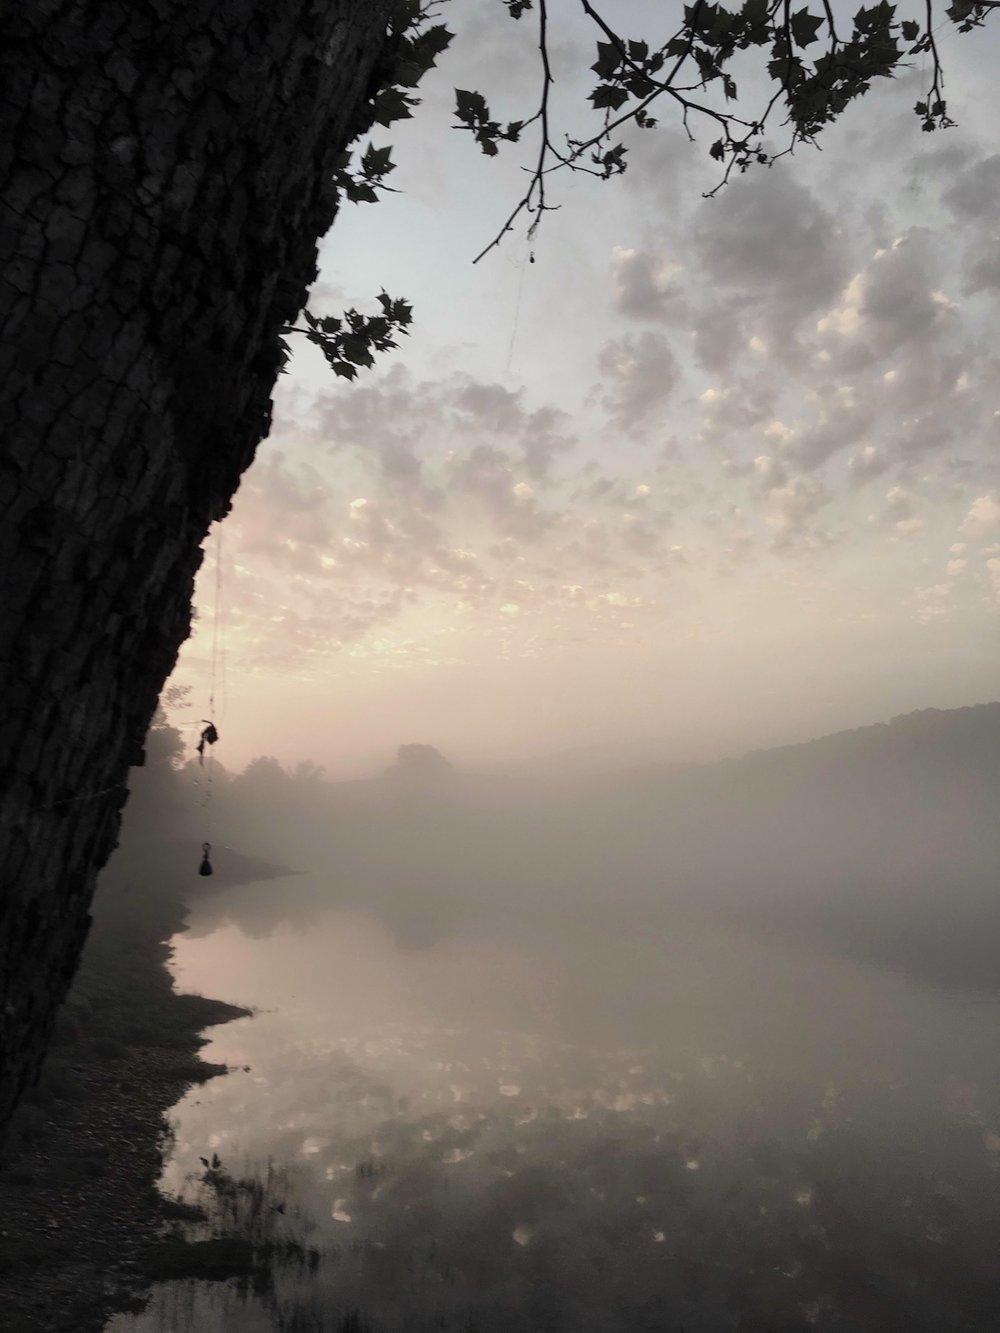 fishing_tree_at_dawn.jpg